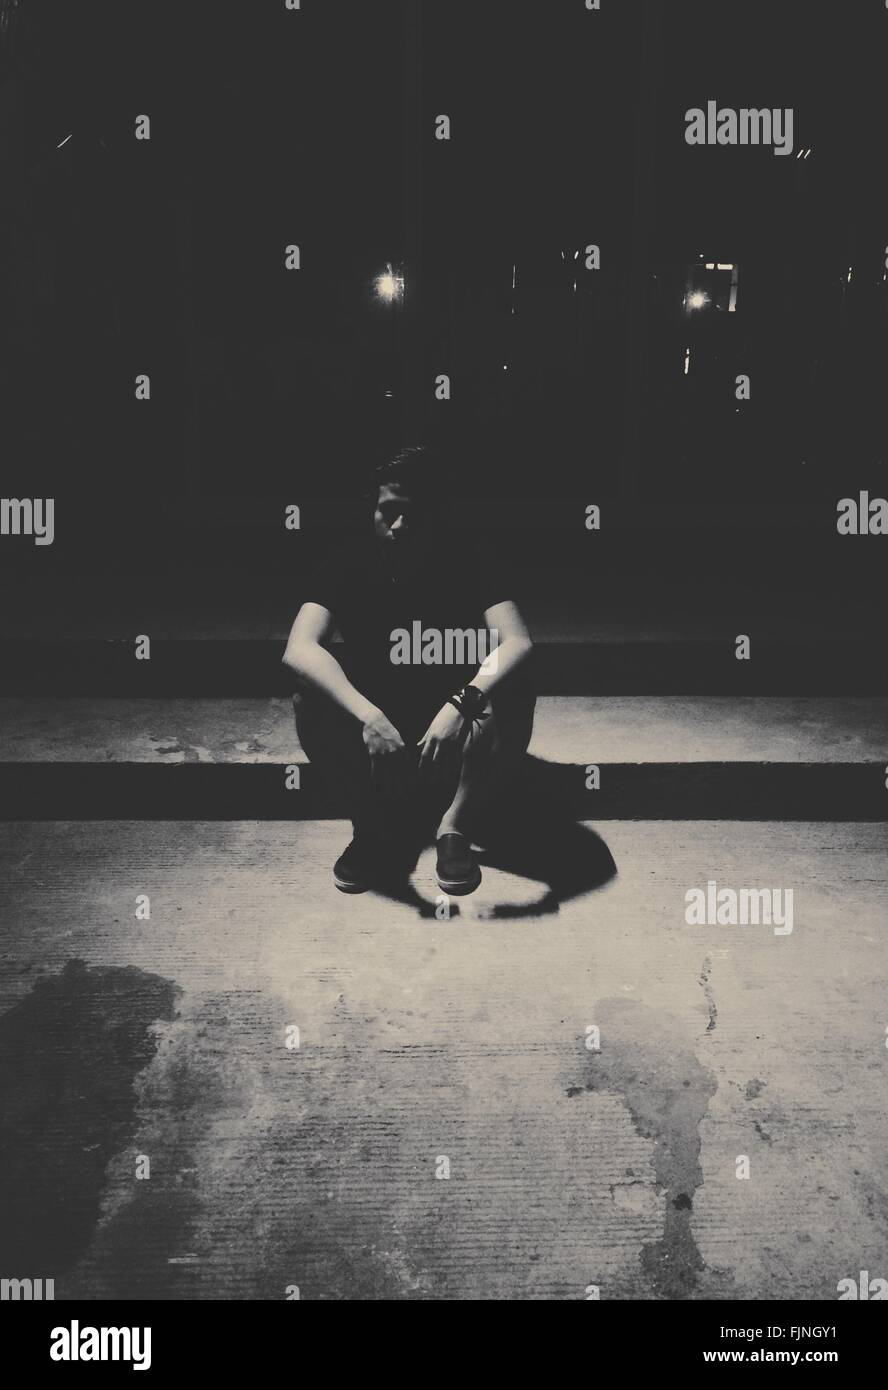 Lonely Man seduta sul sentiero nel buio Immagini Stock